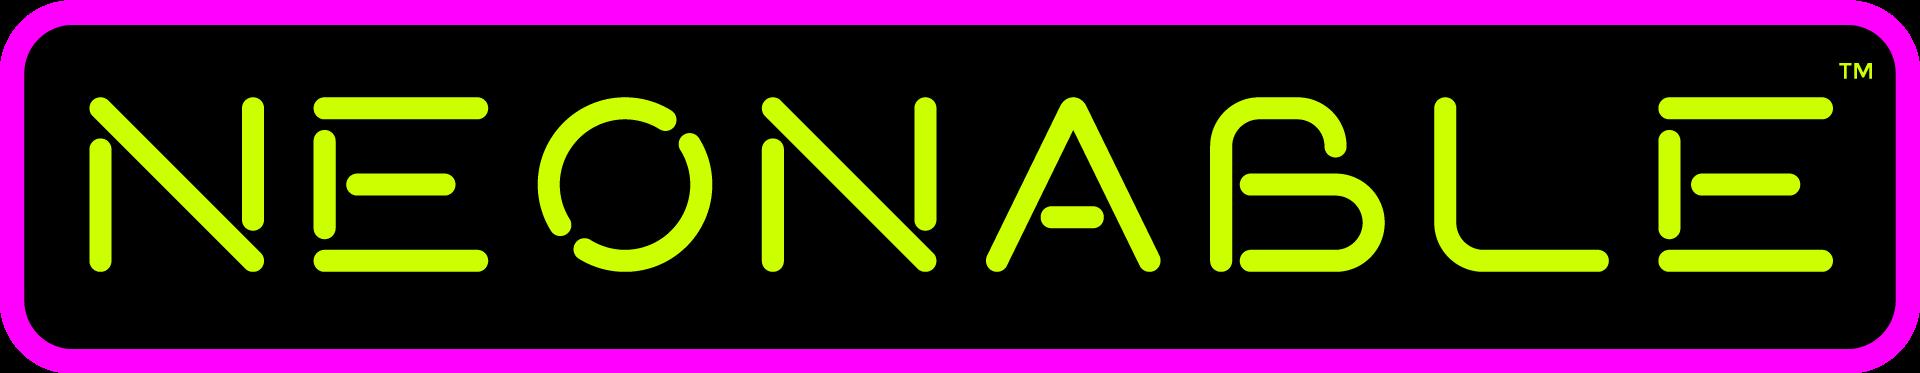 Neonable Logo Colors